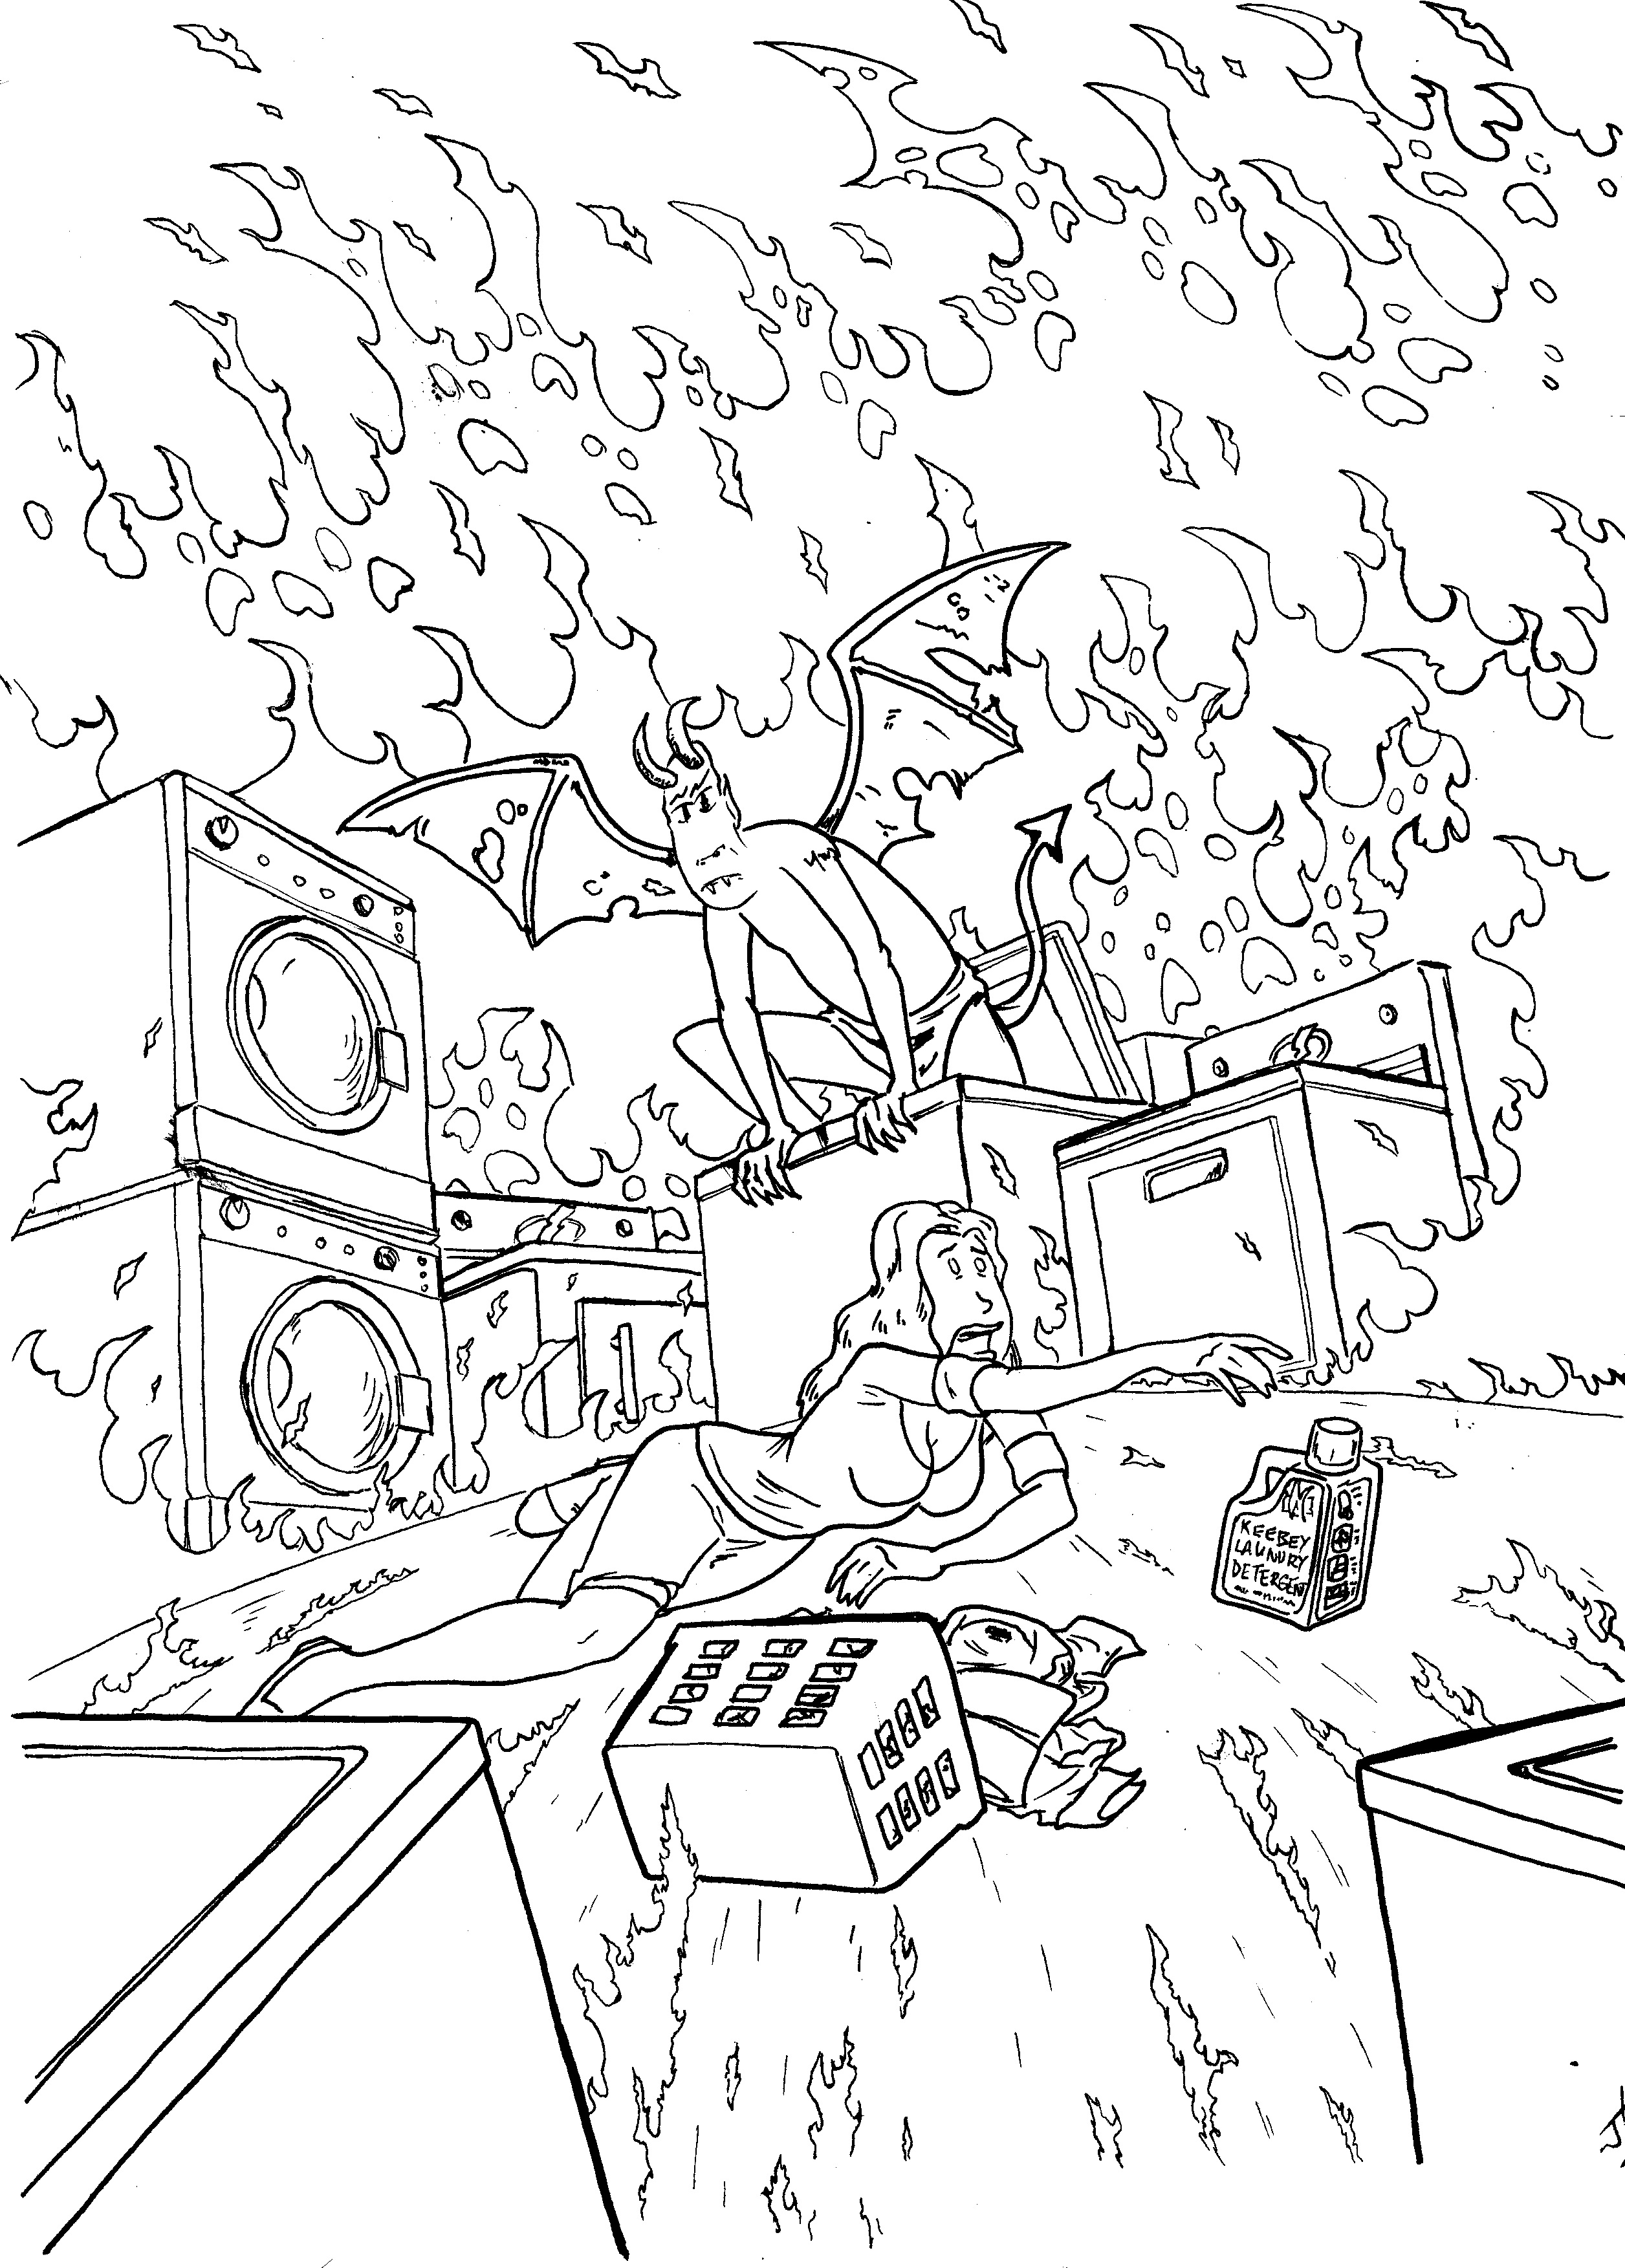 laundramat-hell-arseniclul01